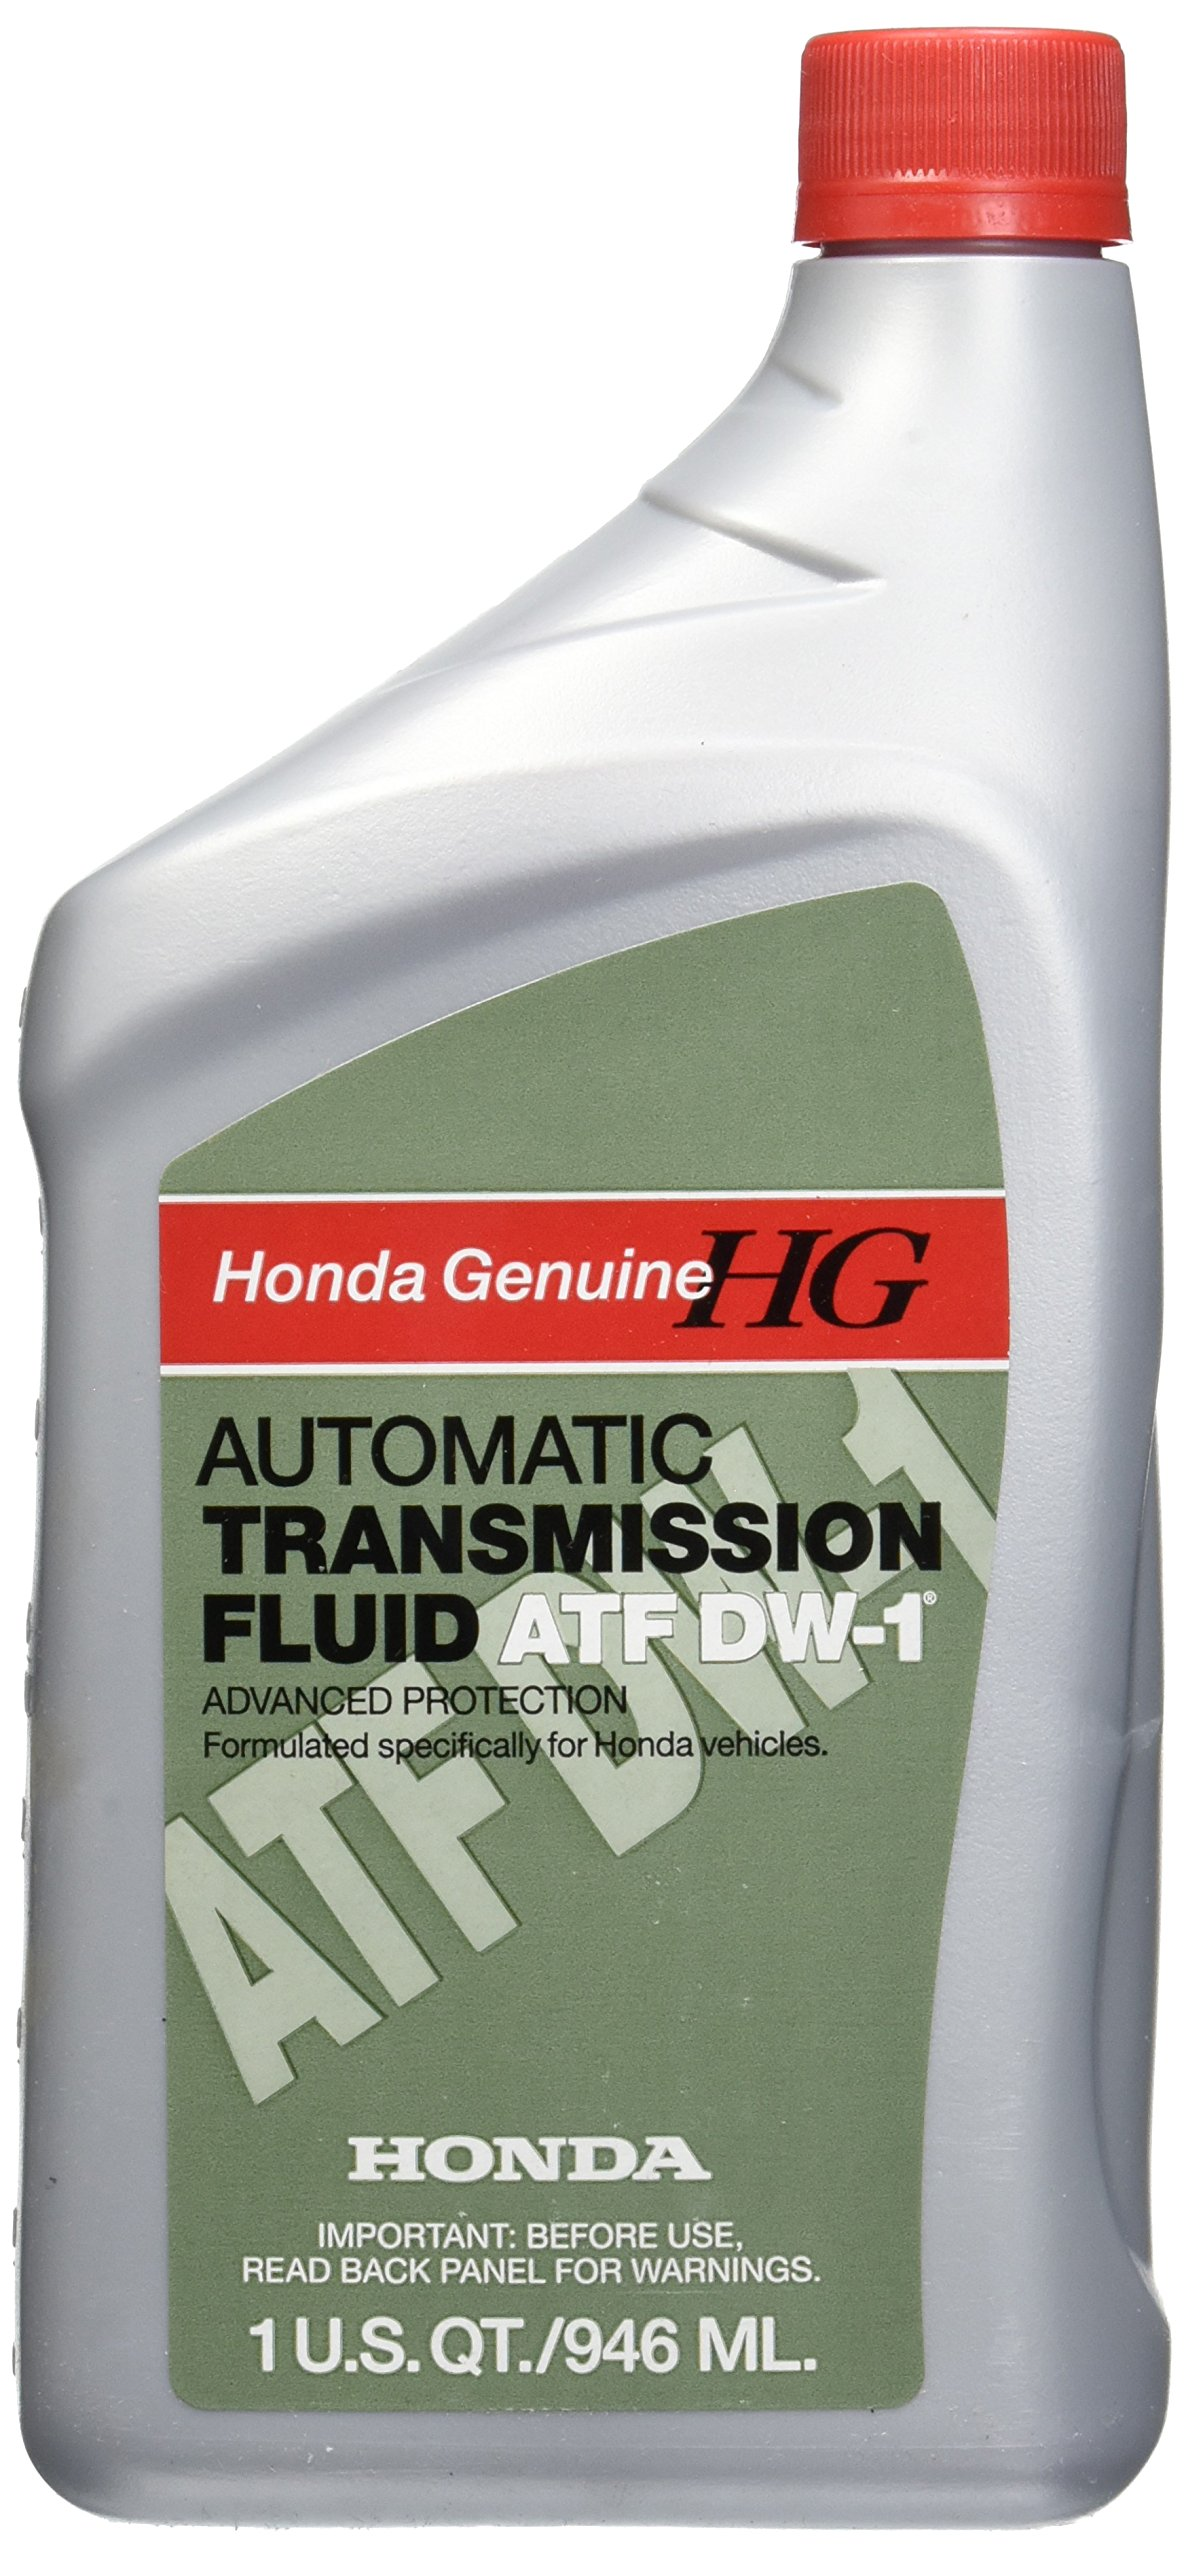 Honda DW-1 Automatic Transmission Fluid, 1 quart, Pack of 12 by Honda